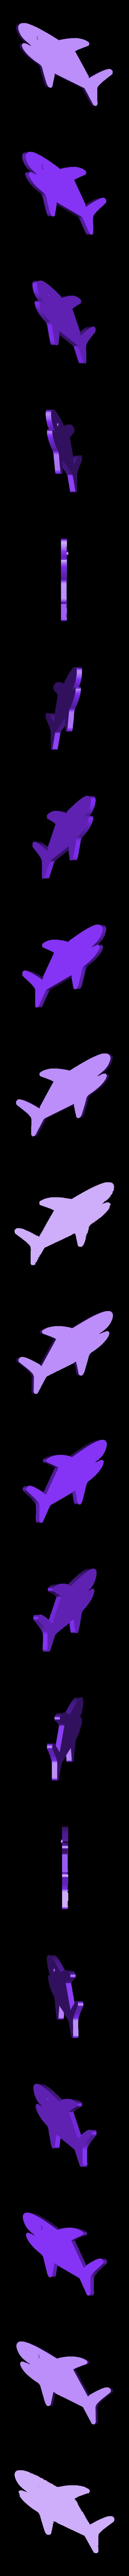 tiburon.stl Download STL file Tiburon Seal • 3D print model, 3DLuxe